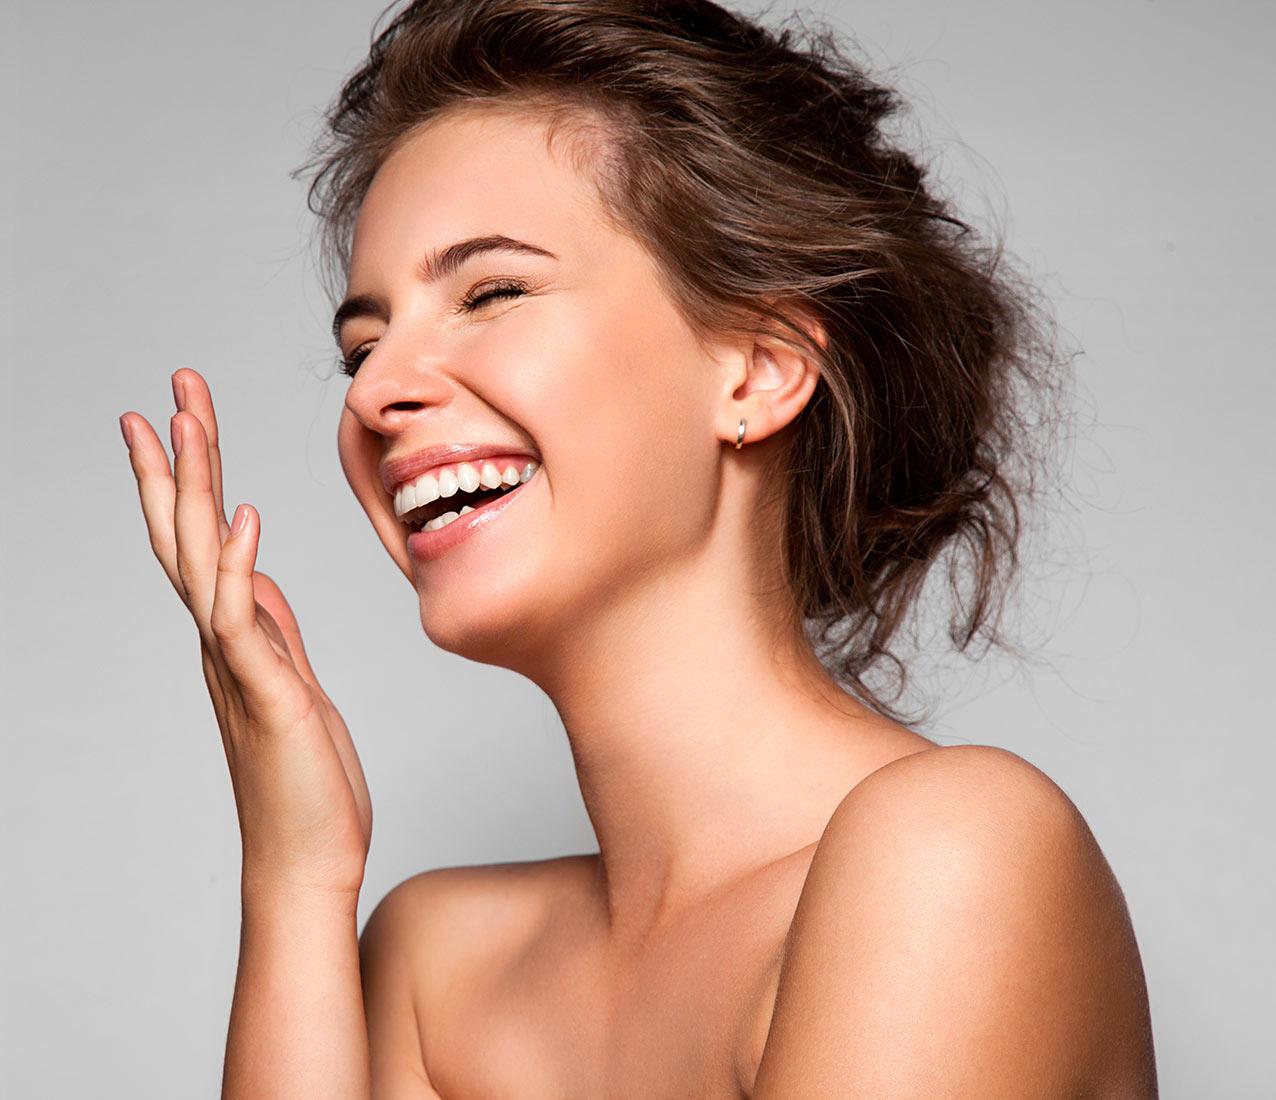 tratamiento arrugas botox Madrid